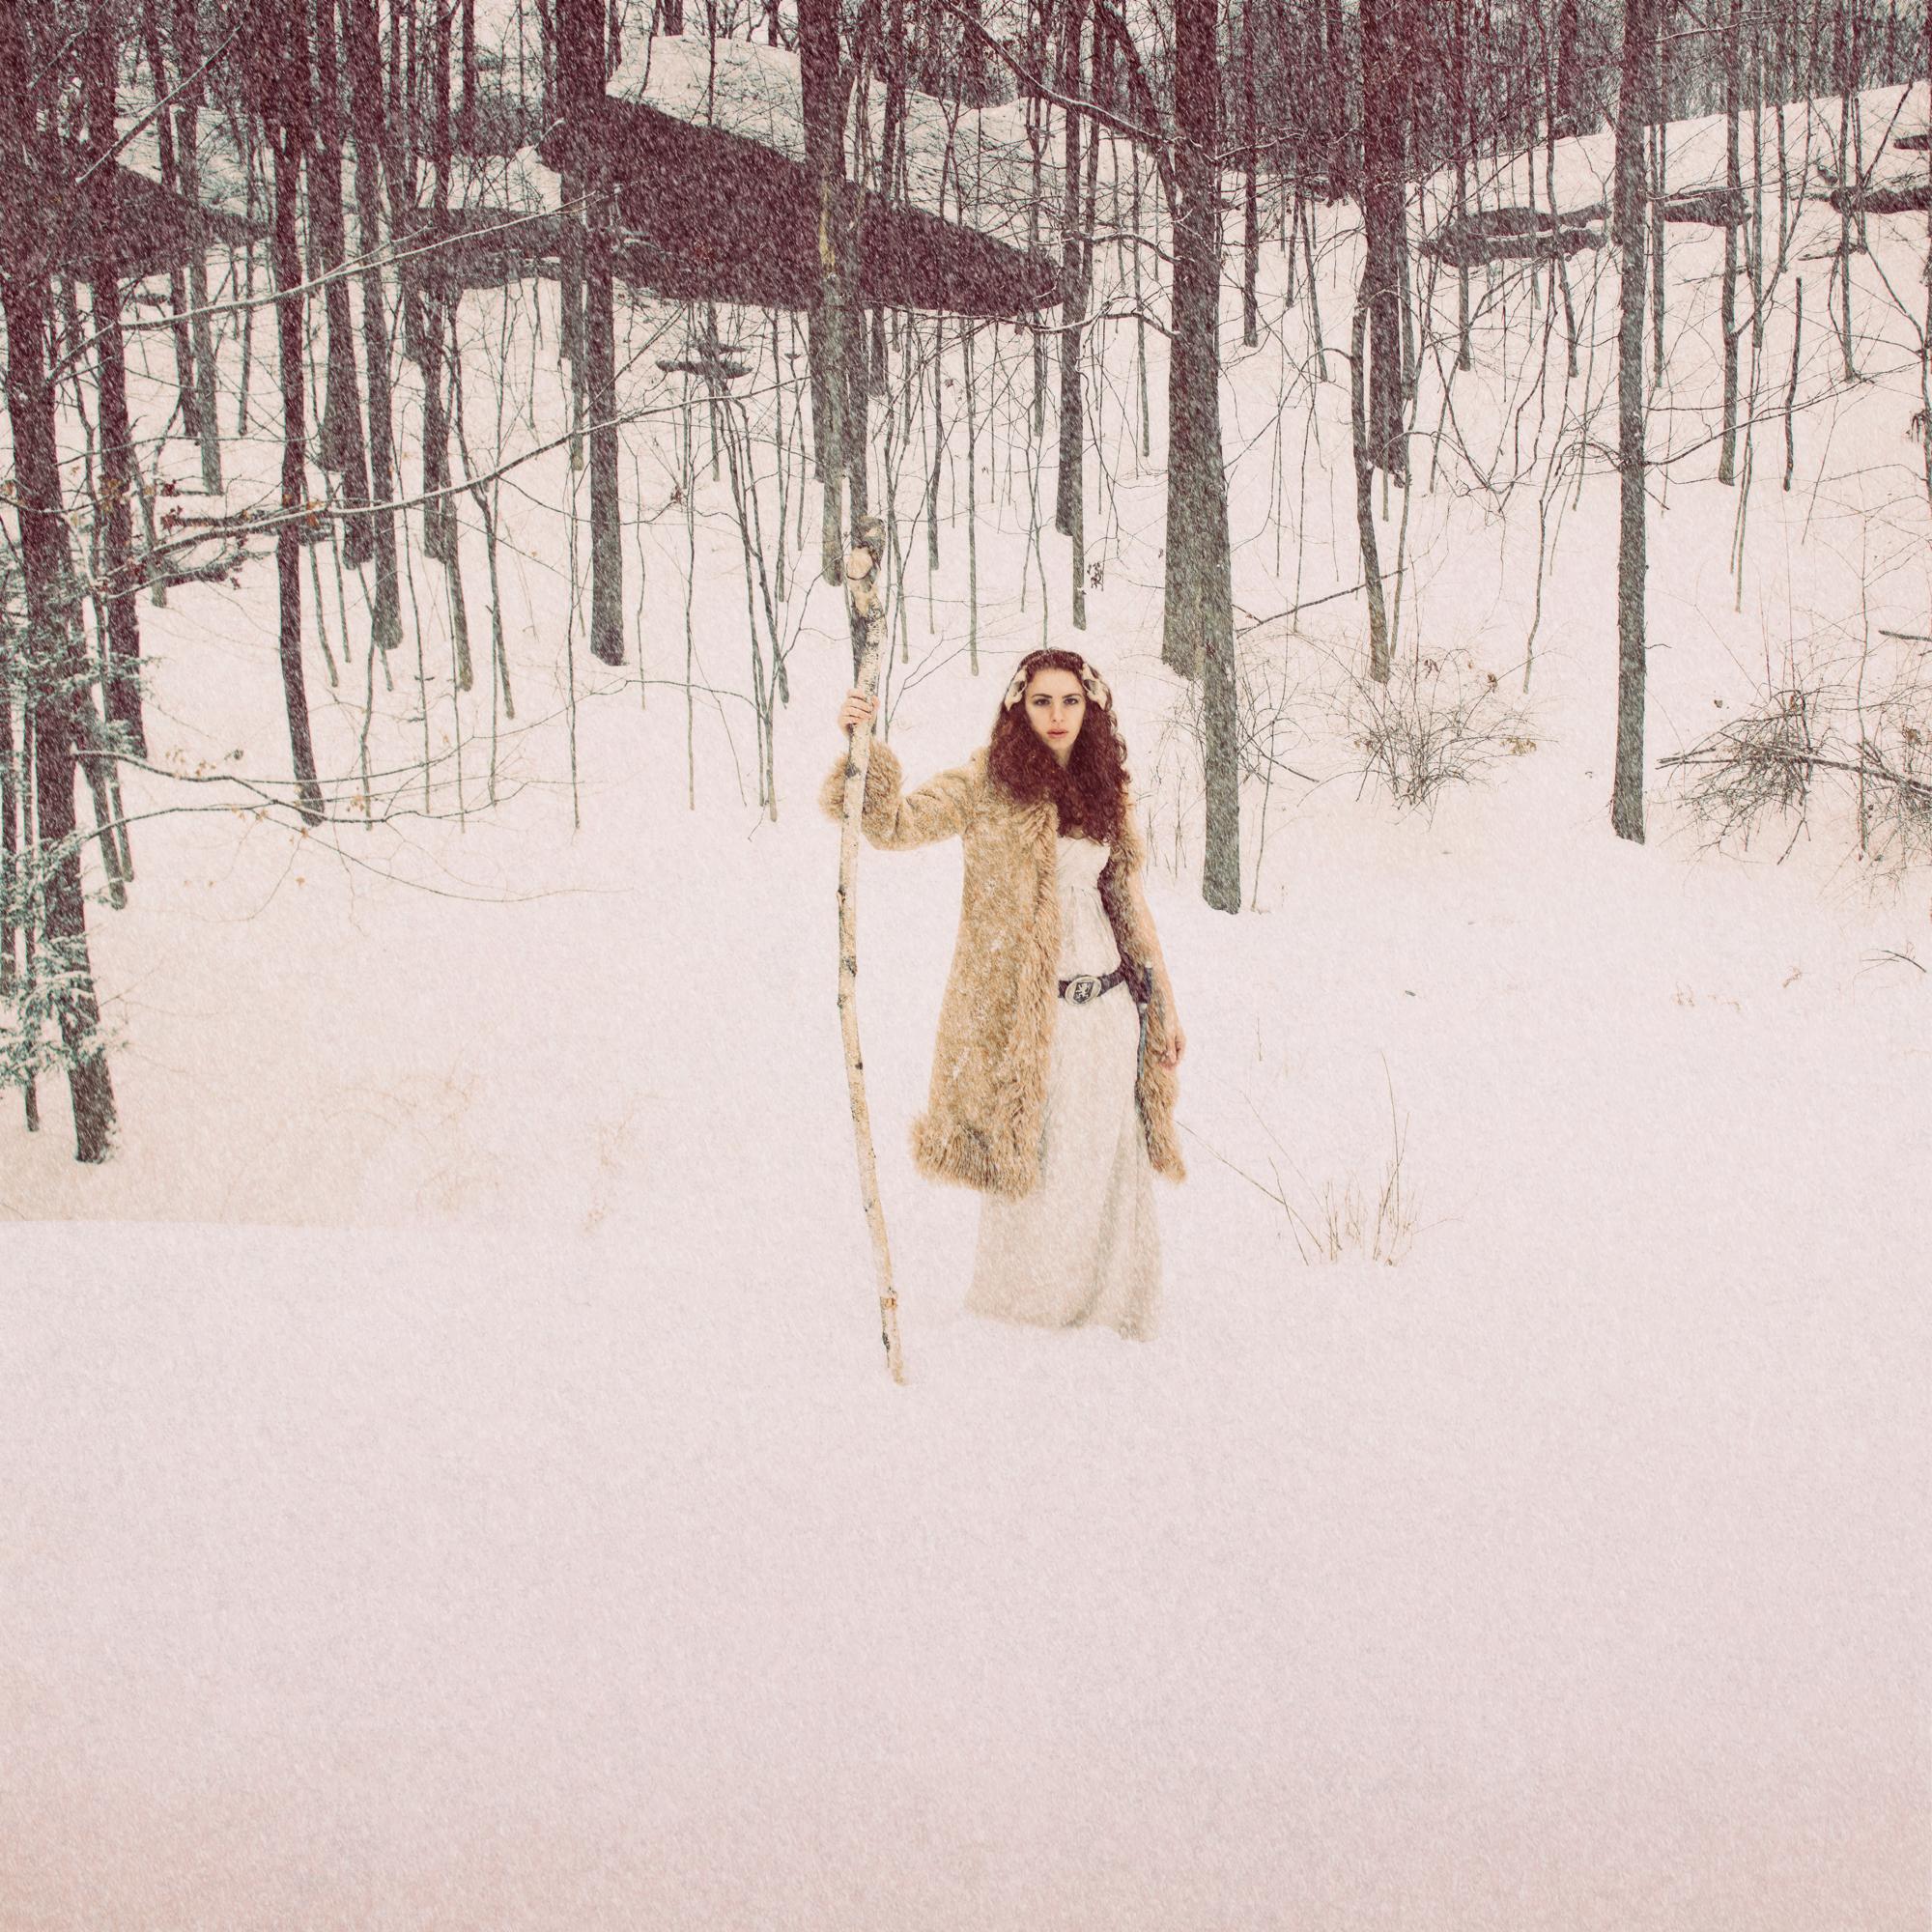 Jen-Kiaba-fantasy-Fine-Art-Photography-Rhinebeck-New-York(43).jpg